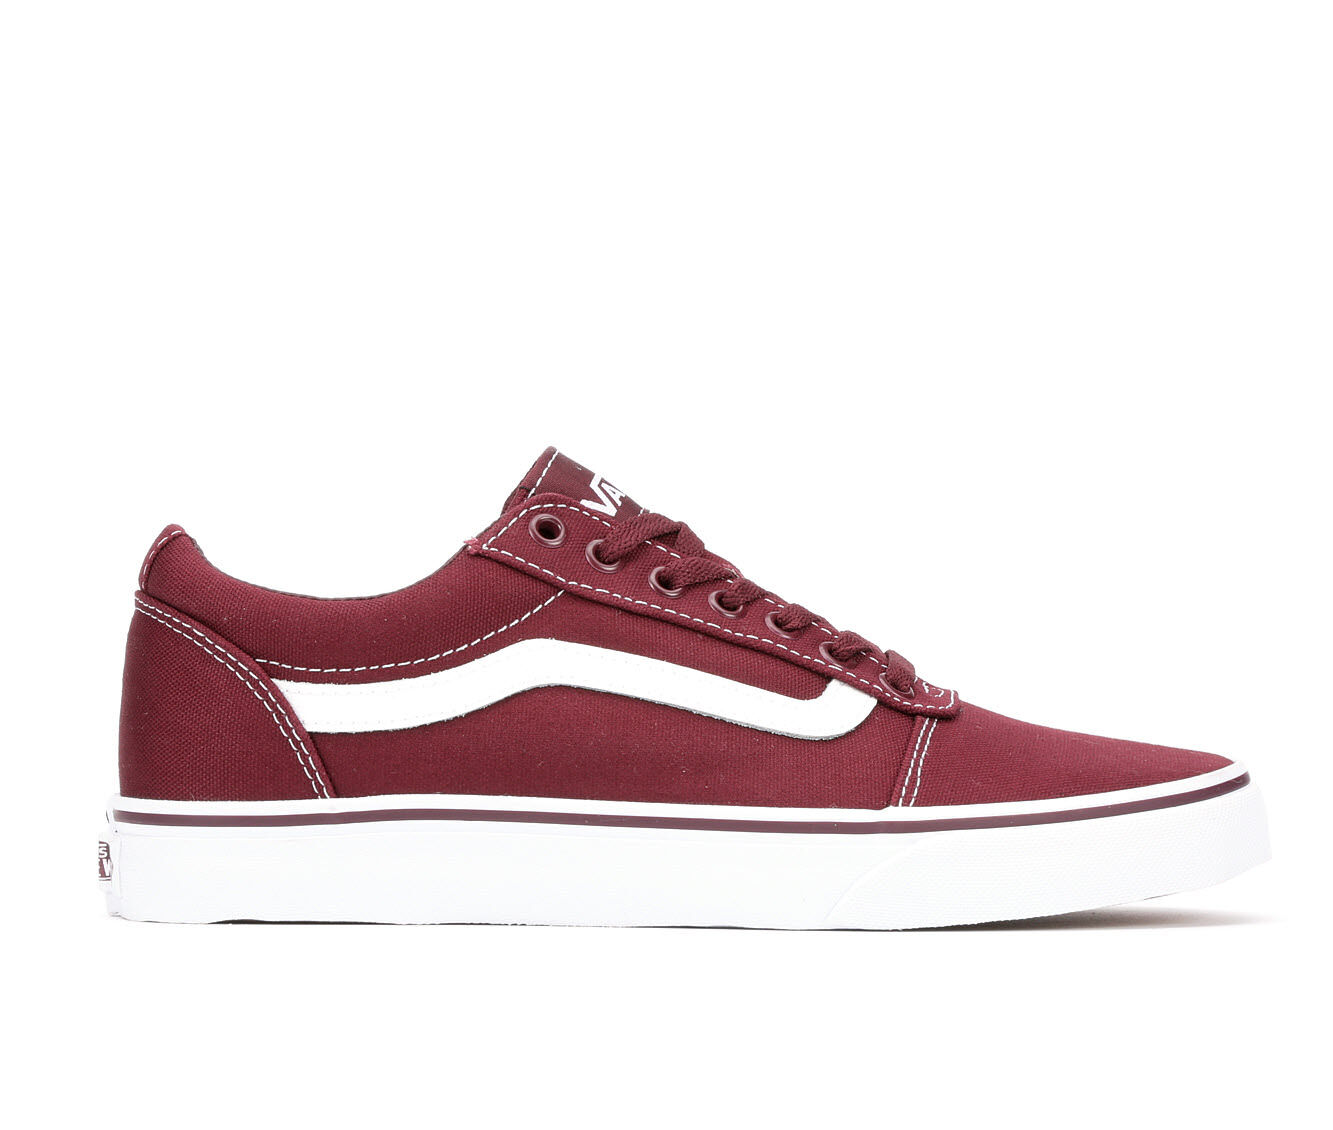 uk shoes_kd1827